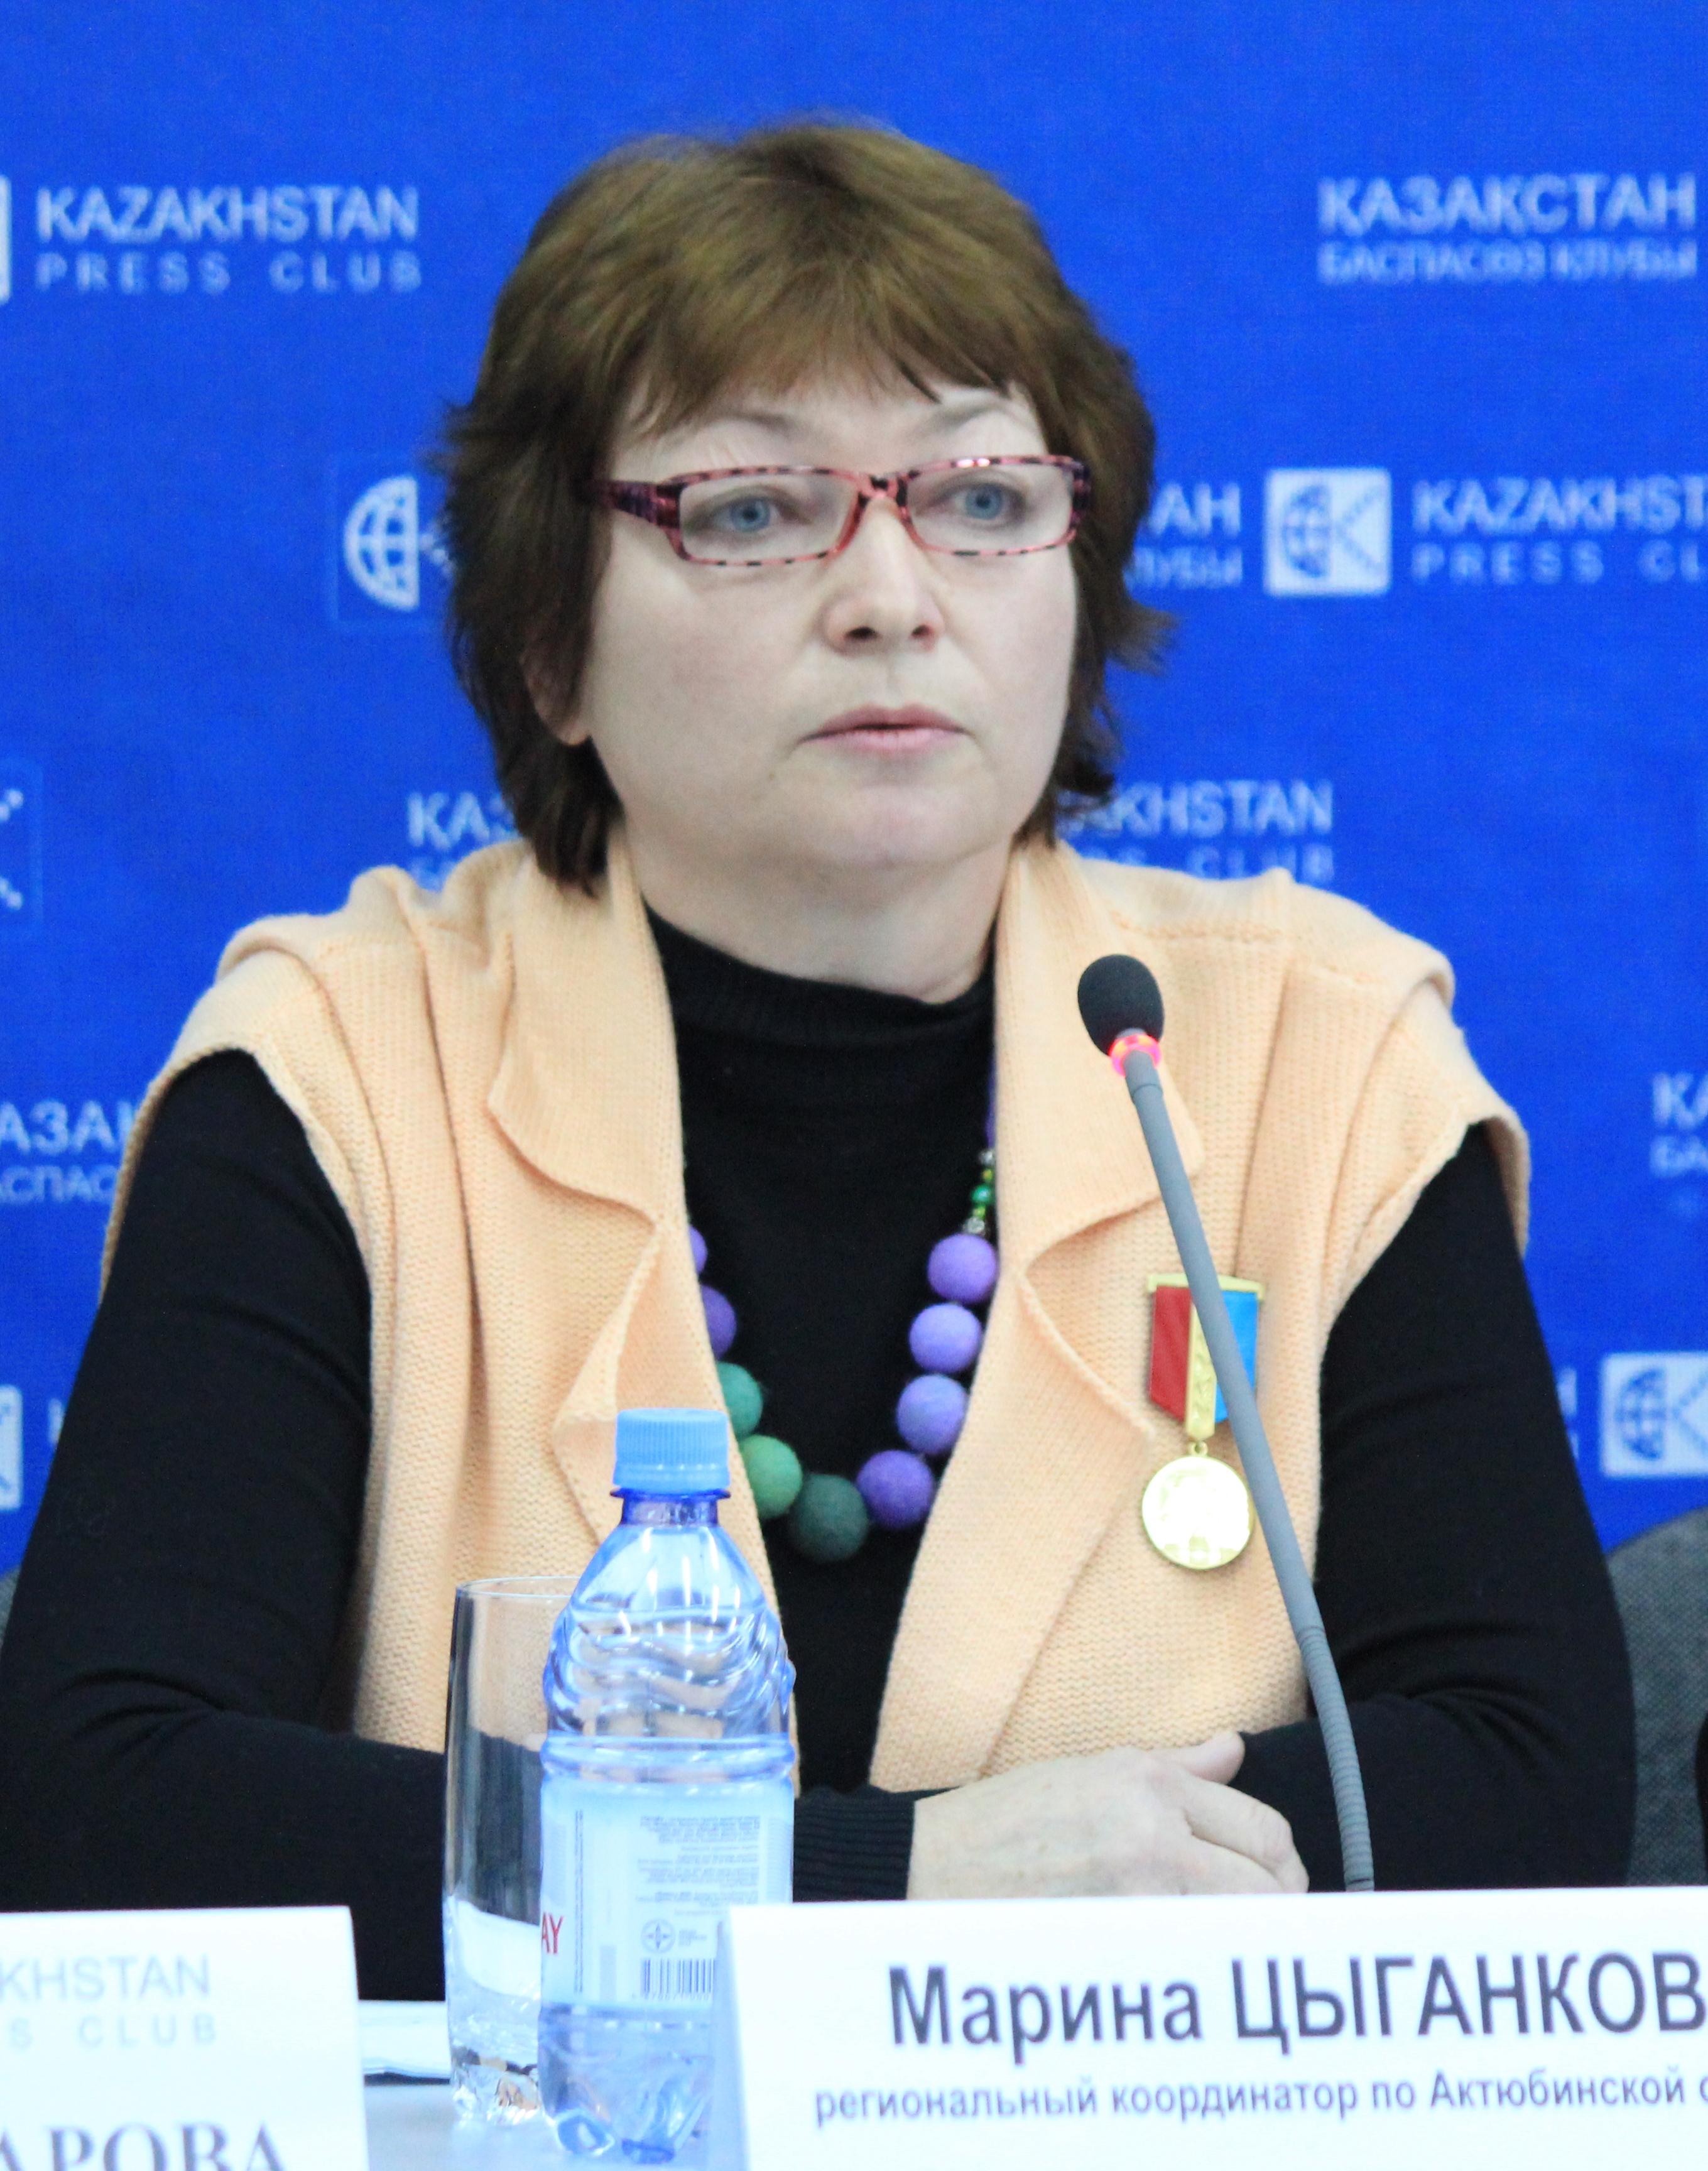 Марина Цыганкова